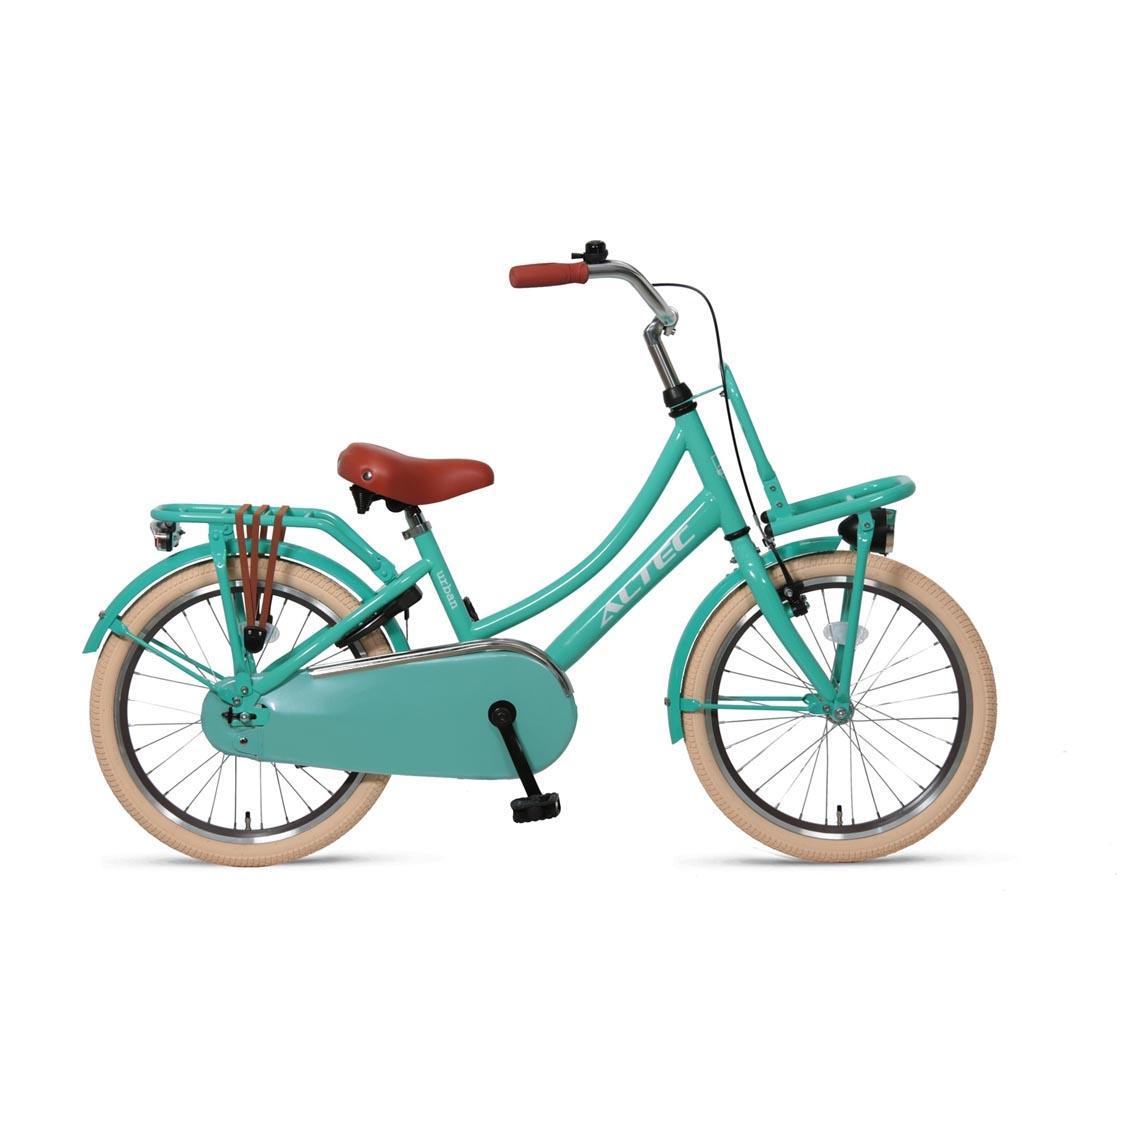 Altec-Urban-20inch-Transportfiets-Ocean-Green-2019 copy